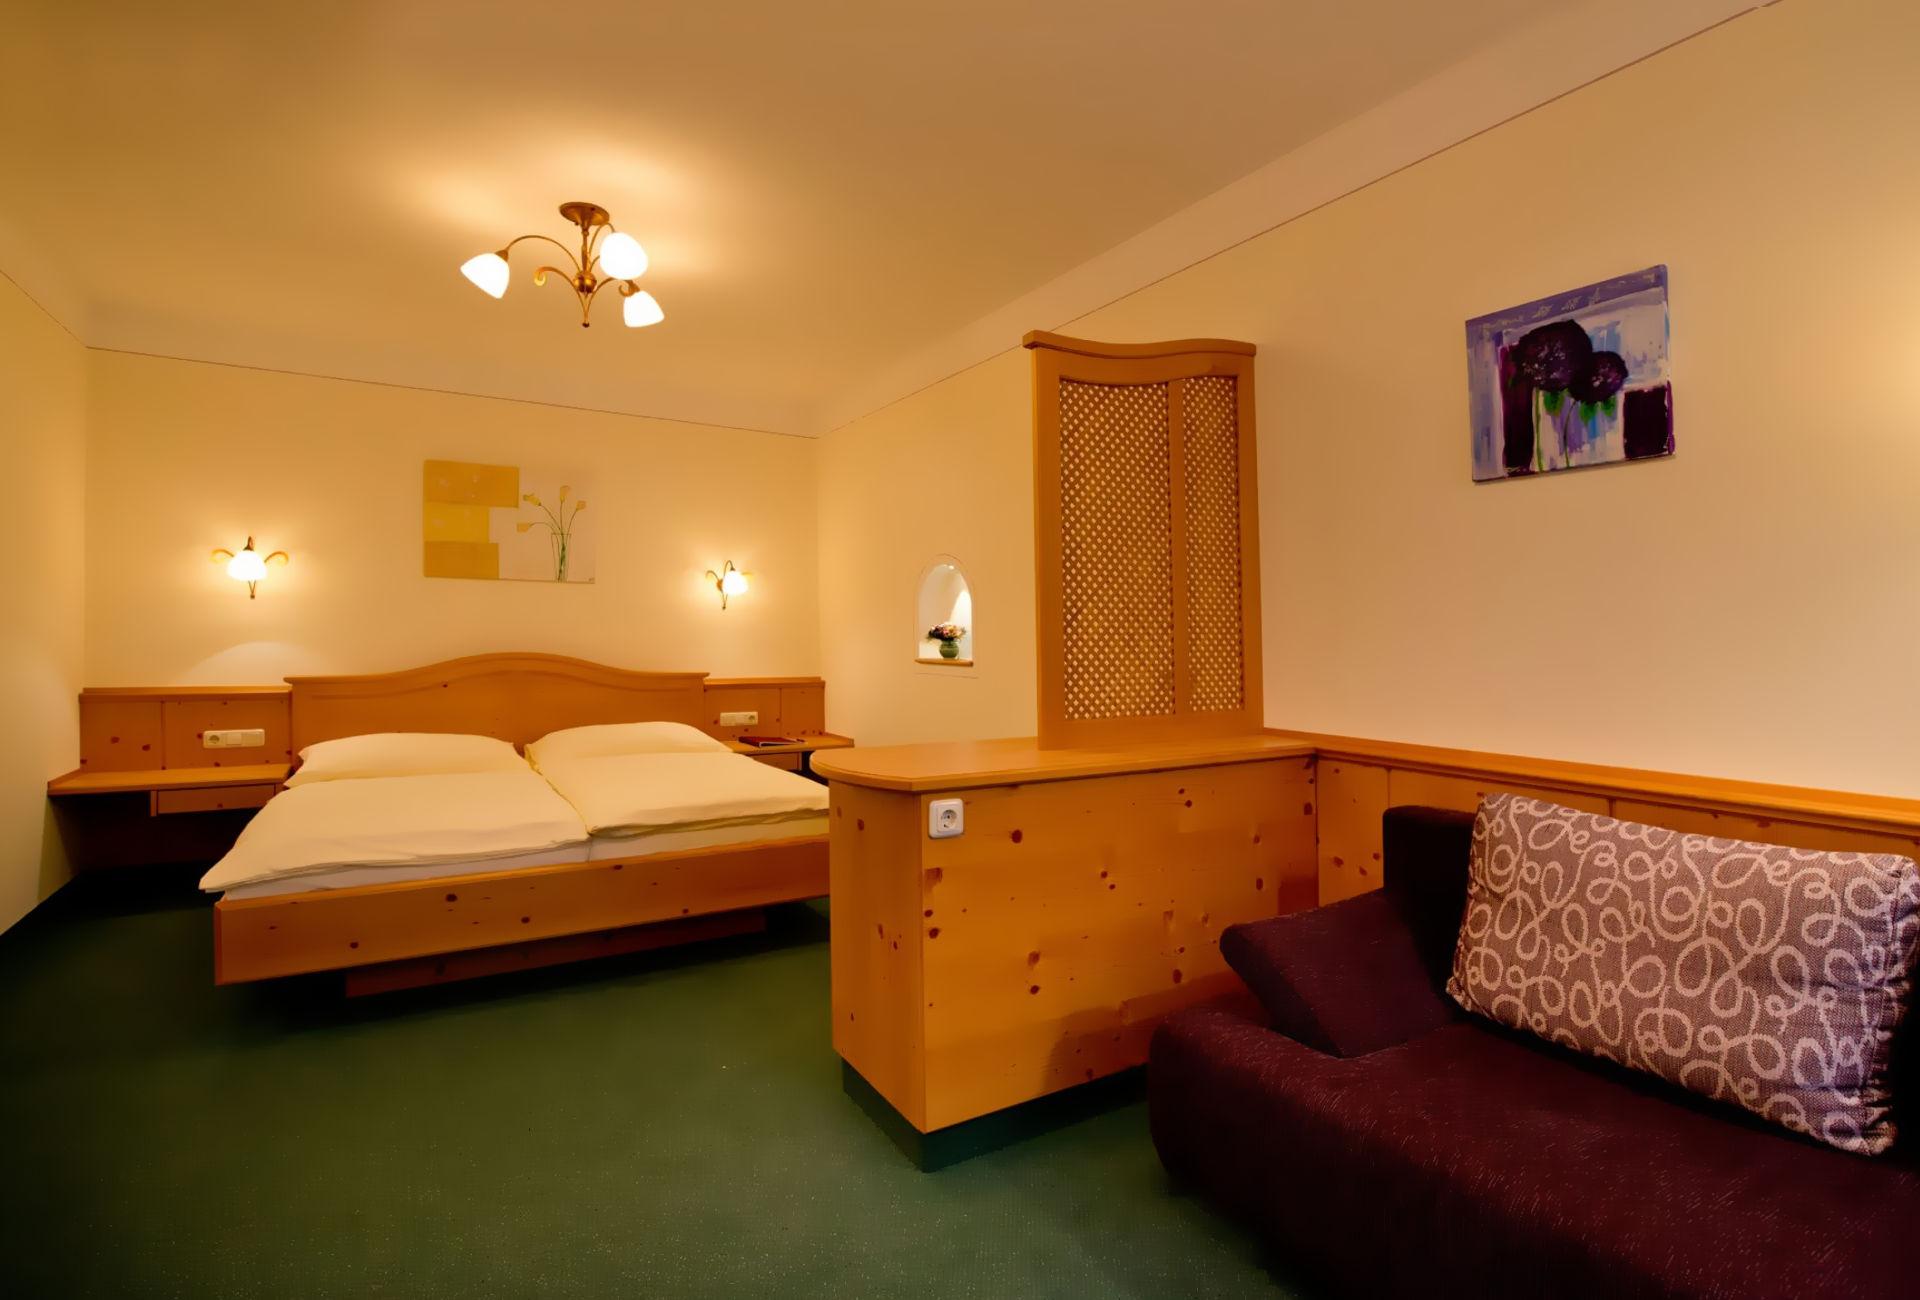 Juniorsuite Celina im Wellness-Hotel-Gasthof Enichlmayr